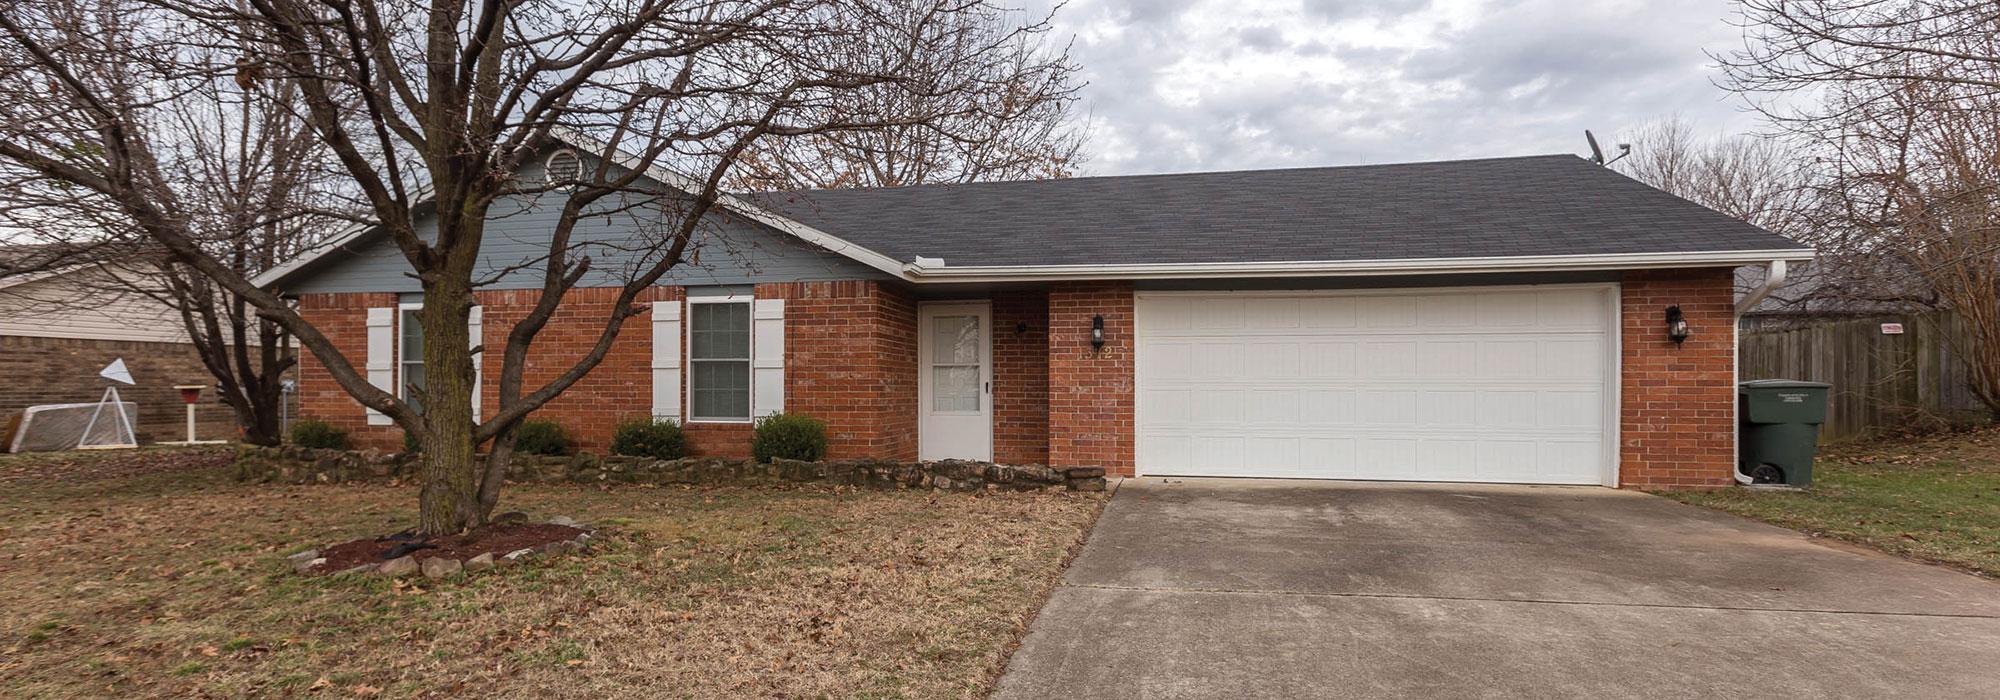 1372 N Pine Creek Dr, Fayetteville, AR 72704